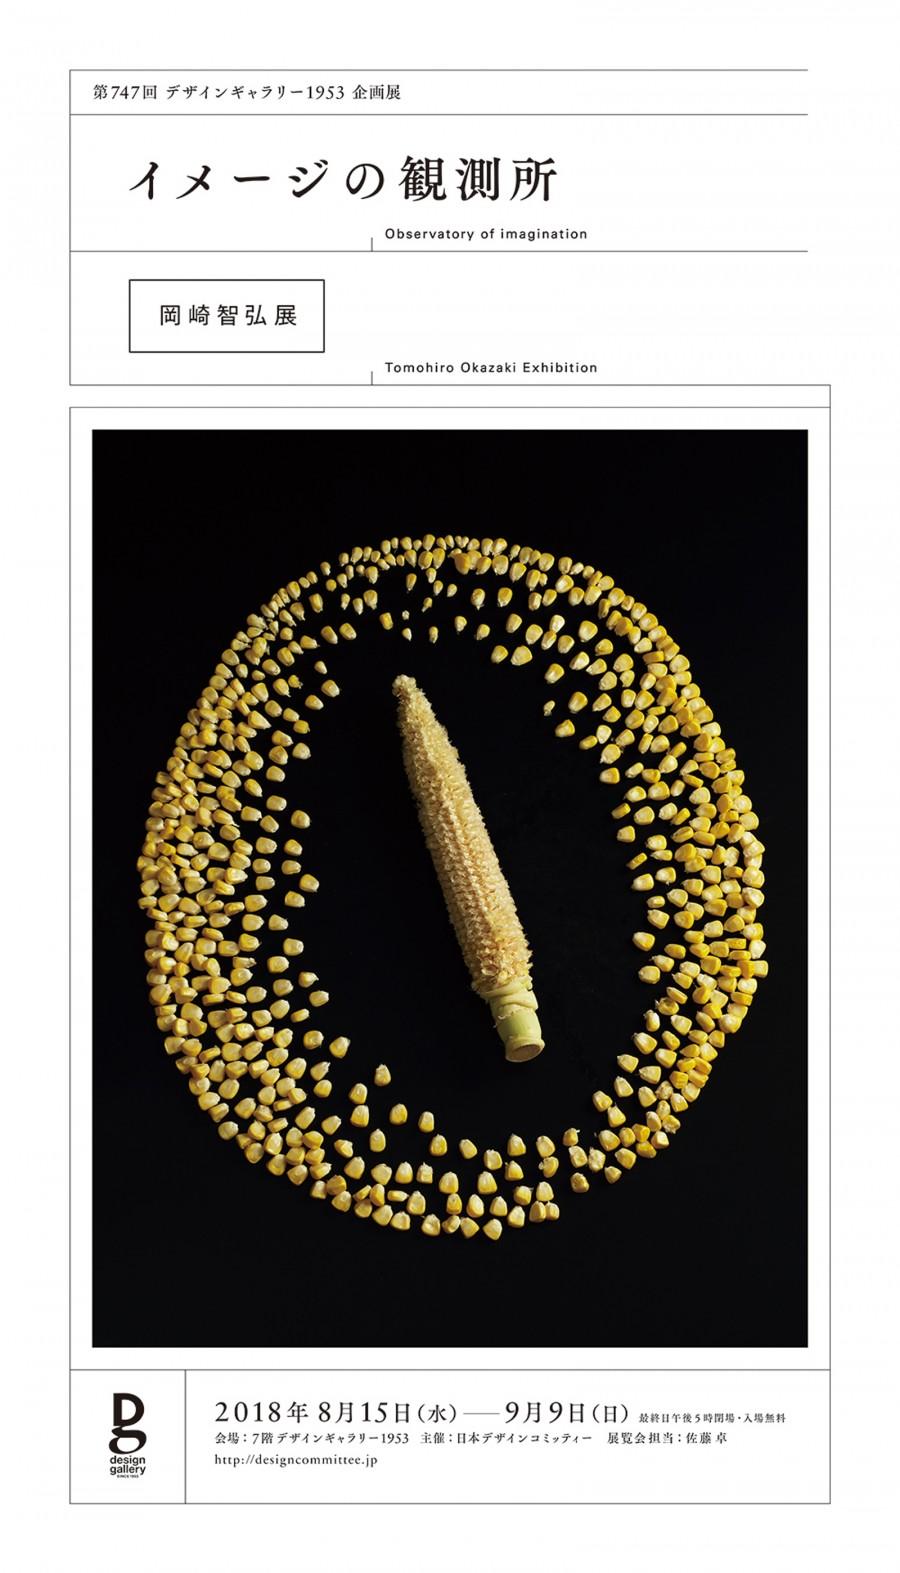 The Exhibition 'Observatory of Imagination' | Tomohiro Okazaki